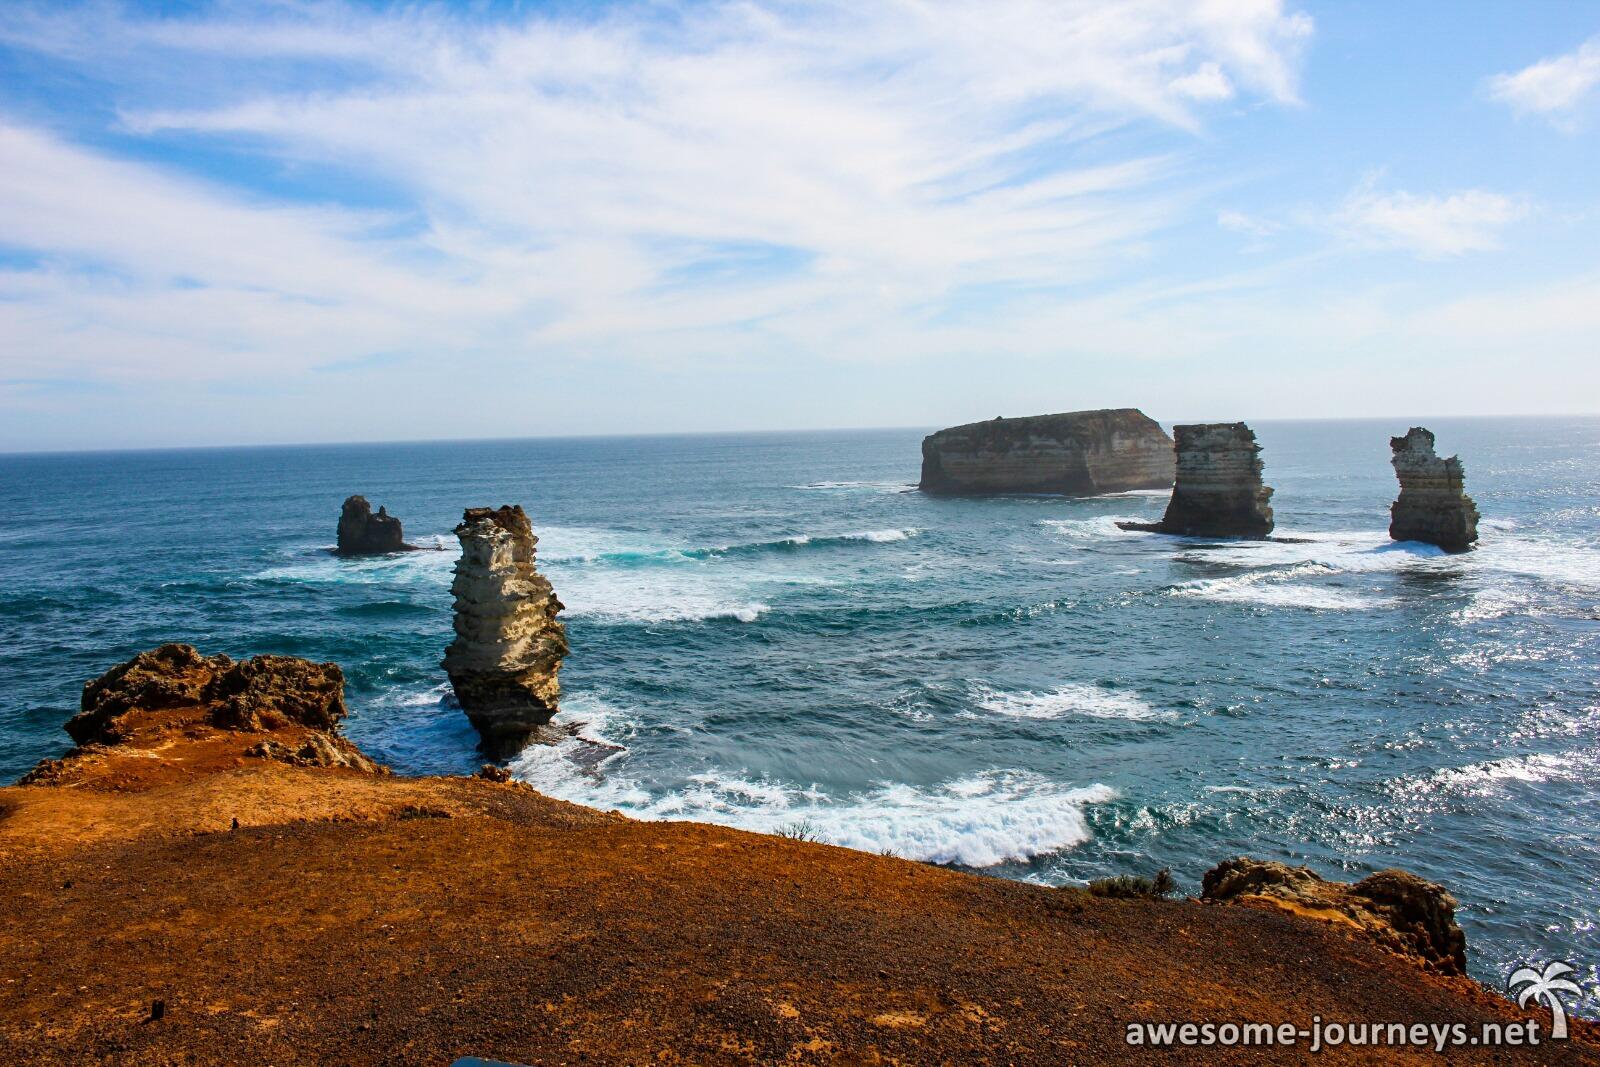 australien_great_ocean_road_bayofislands